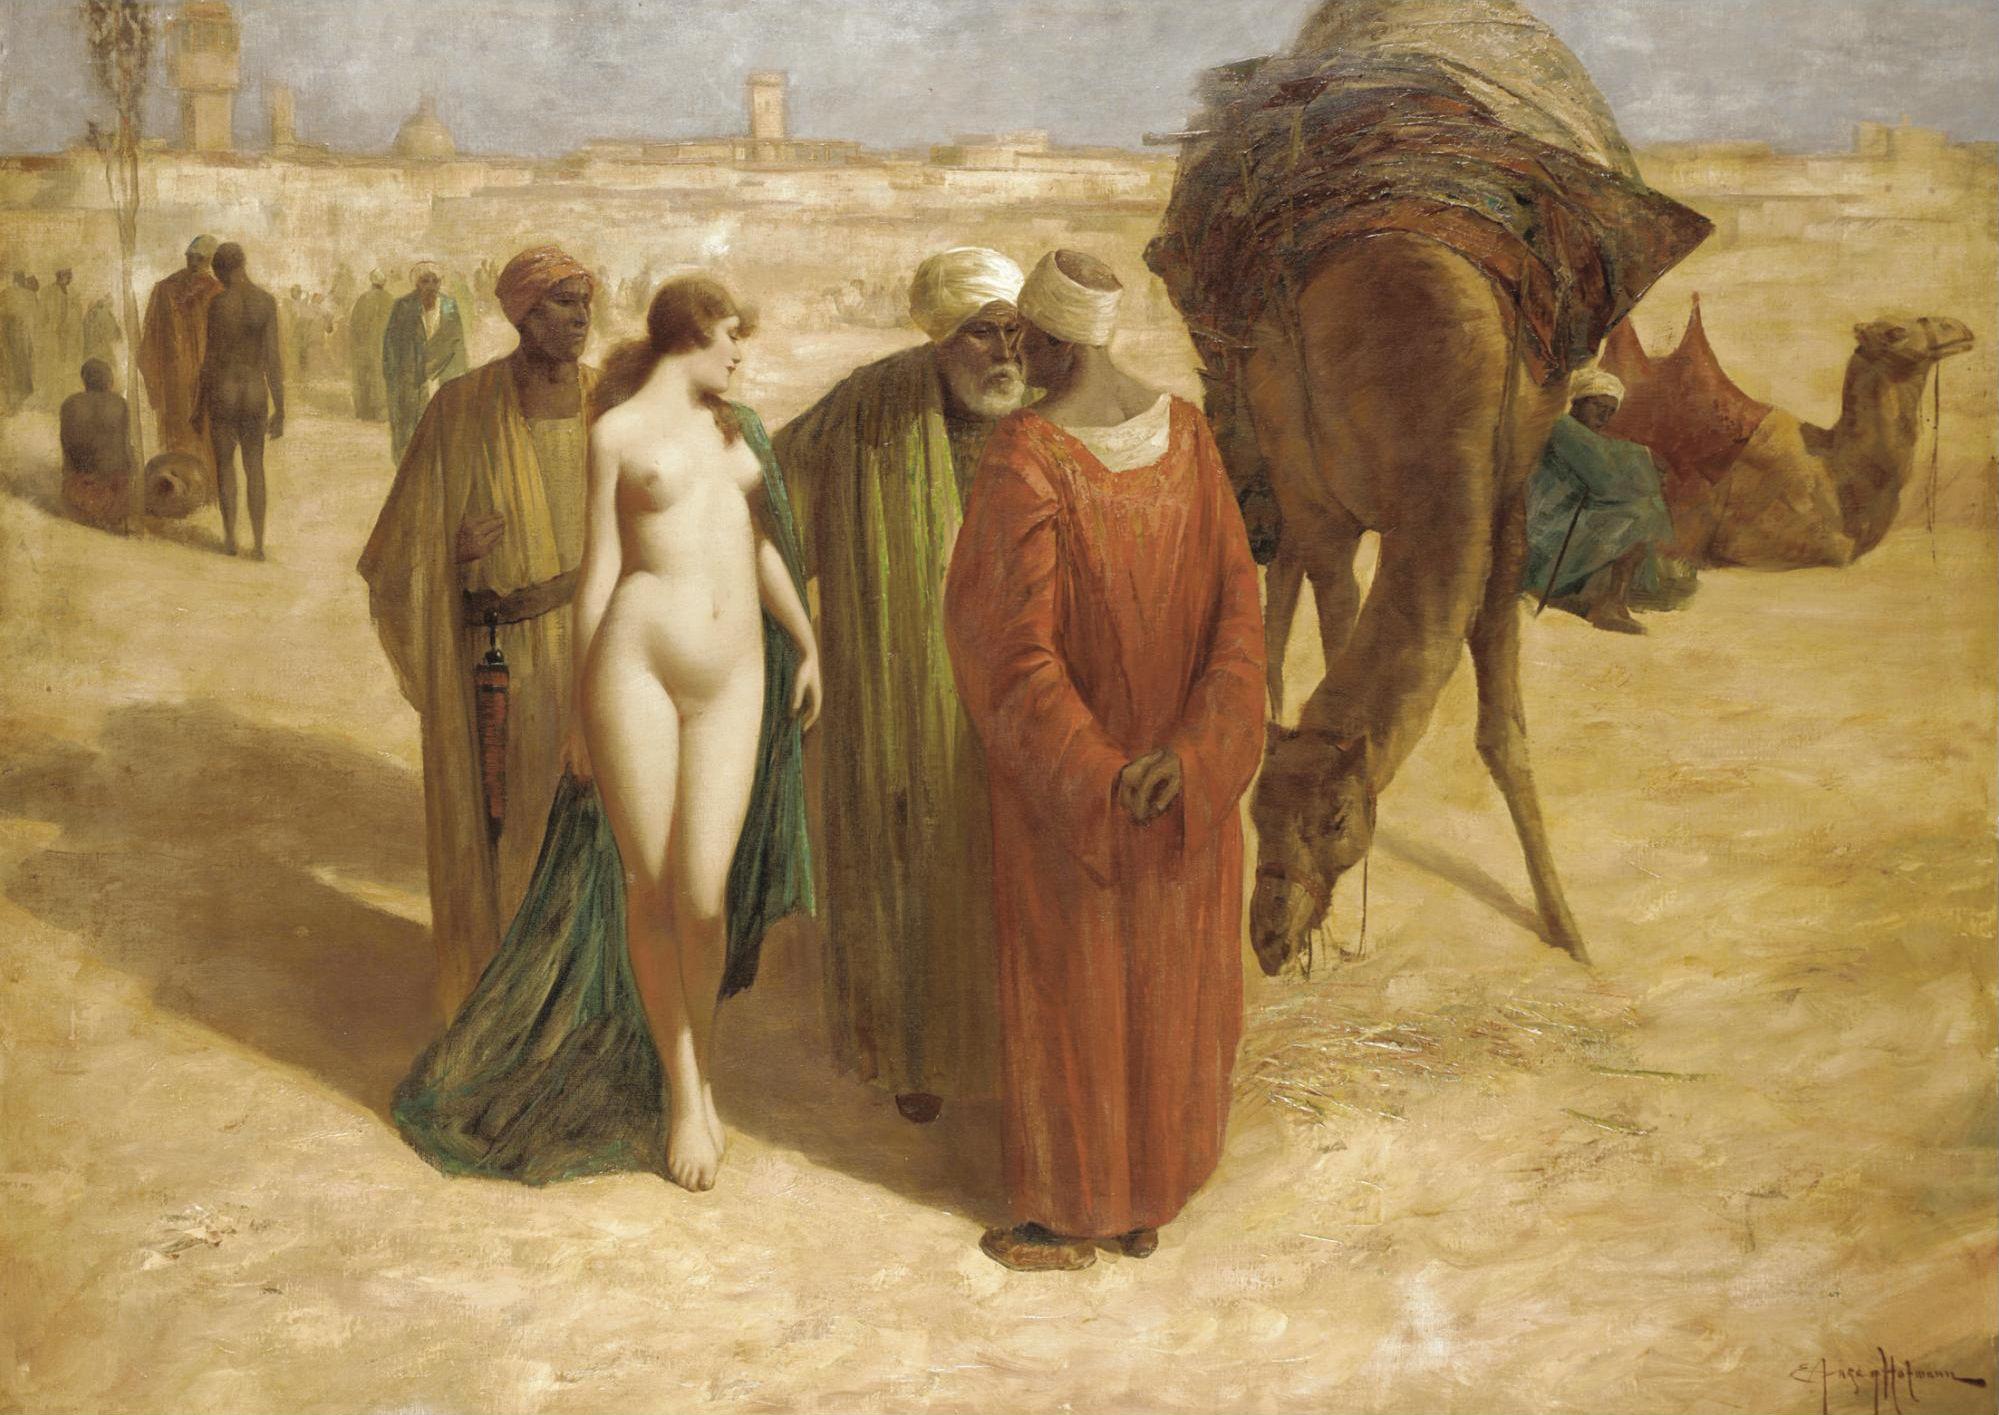 Eduard Ansen-Hofmann, 1820-1904. Торги. 90 х 124 см. Частная коллекция